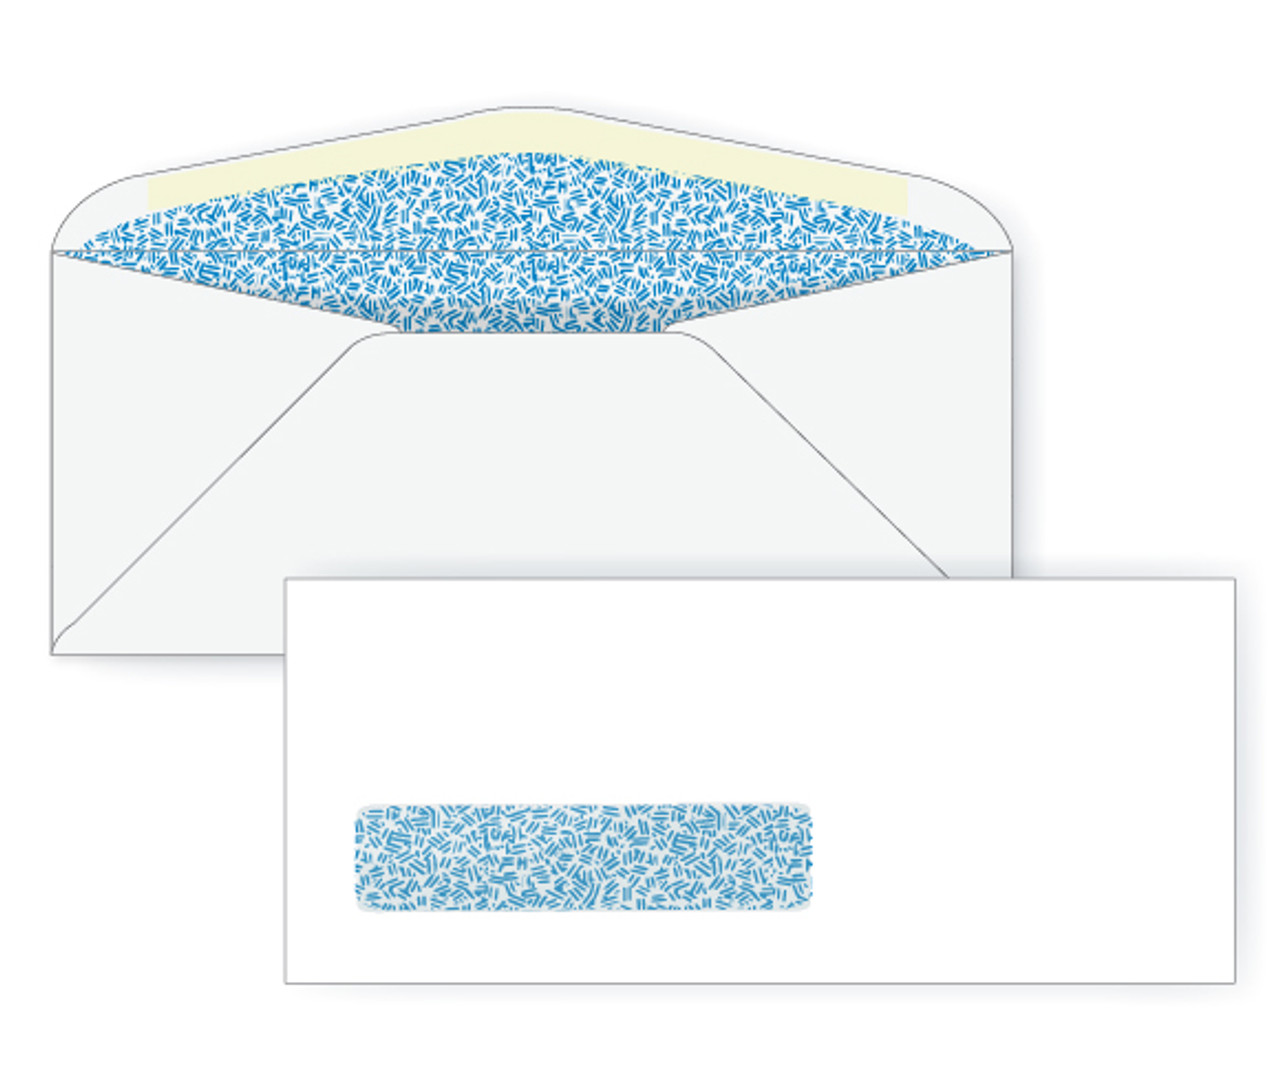 #10 Digital Window Security Envelopes - EB1504